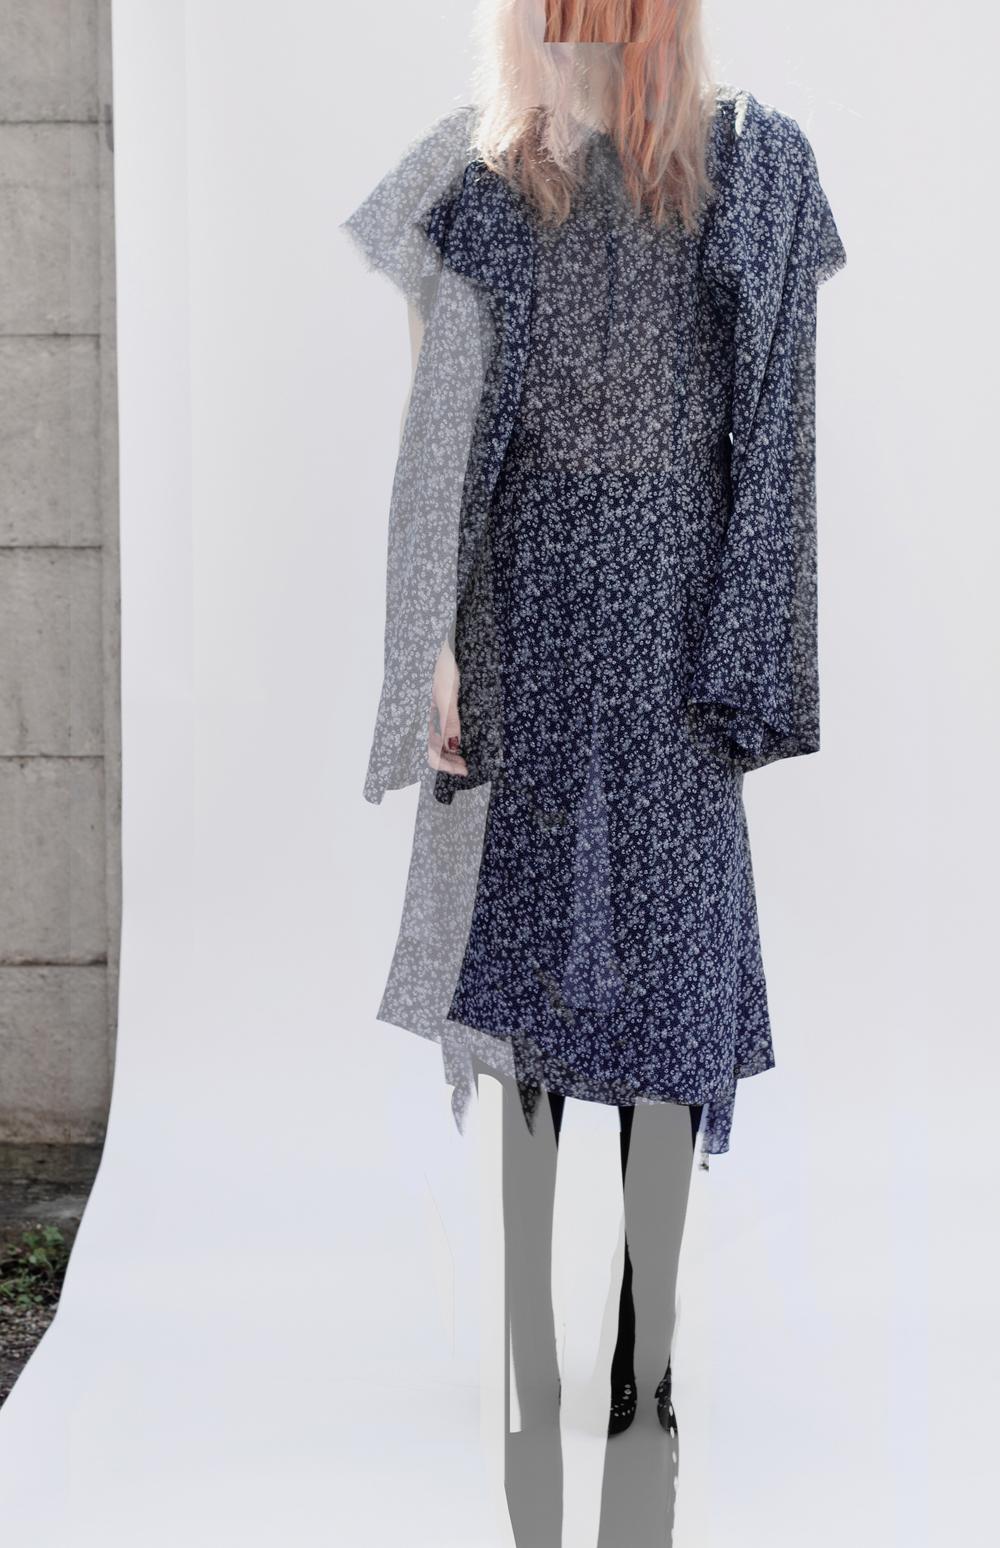 DRESS label Crisis Collection 2017  03) Emerging/disappearing Structure Dress/Set  Navy Blue Print Dress-Ltd